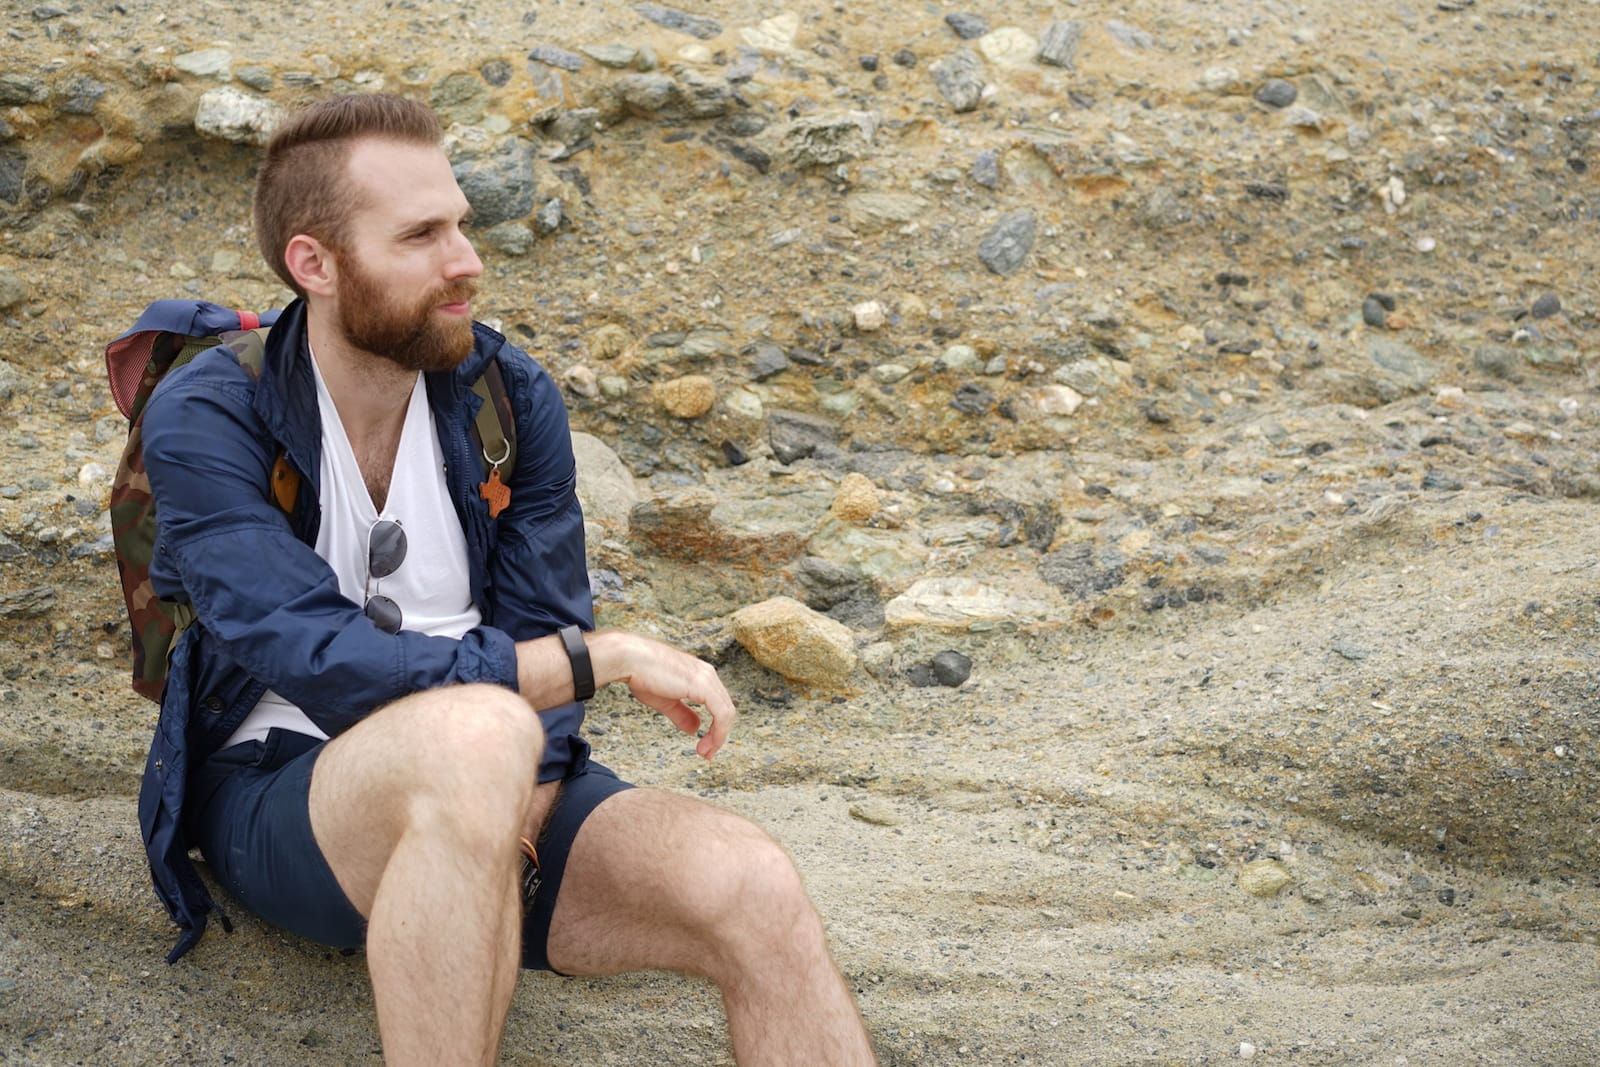 Adam sitting on a beach in Malibu